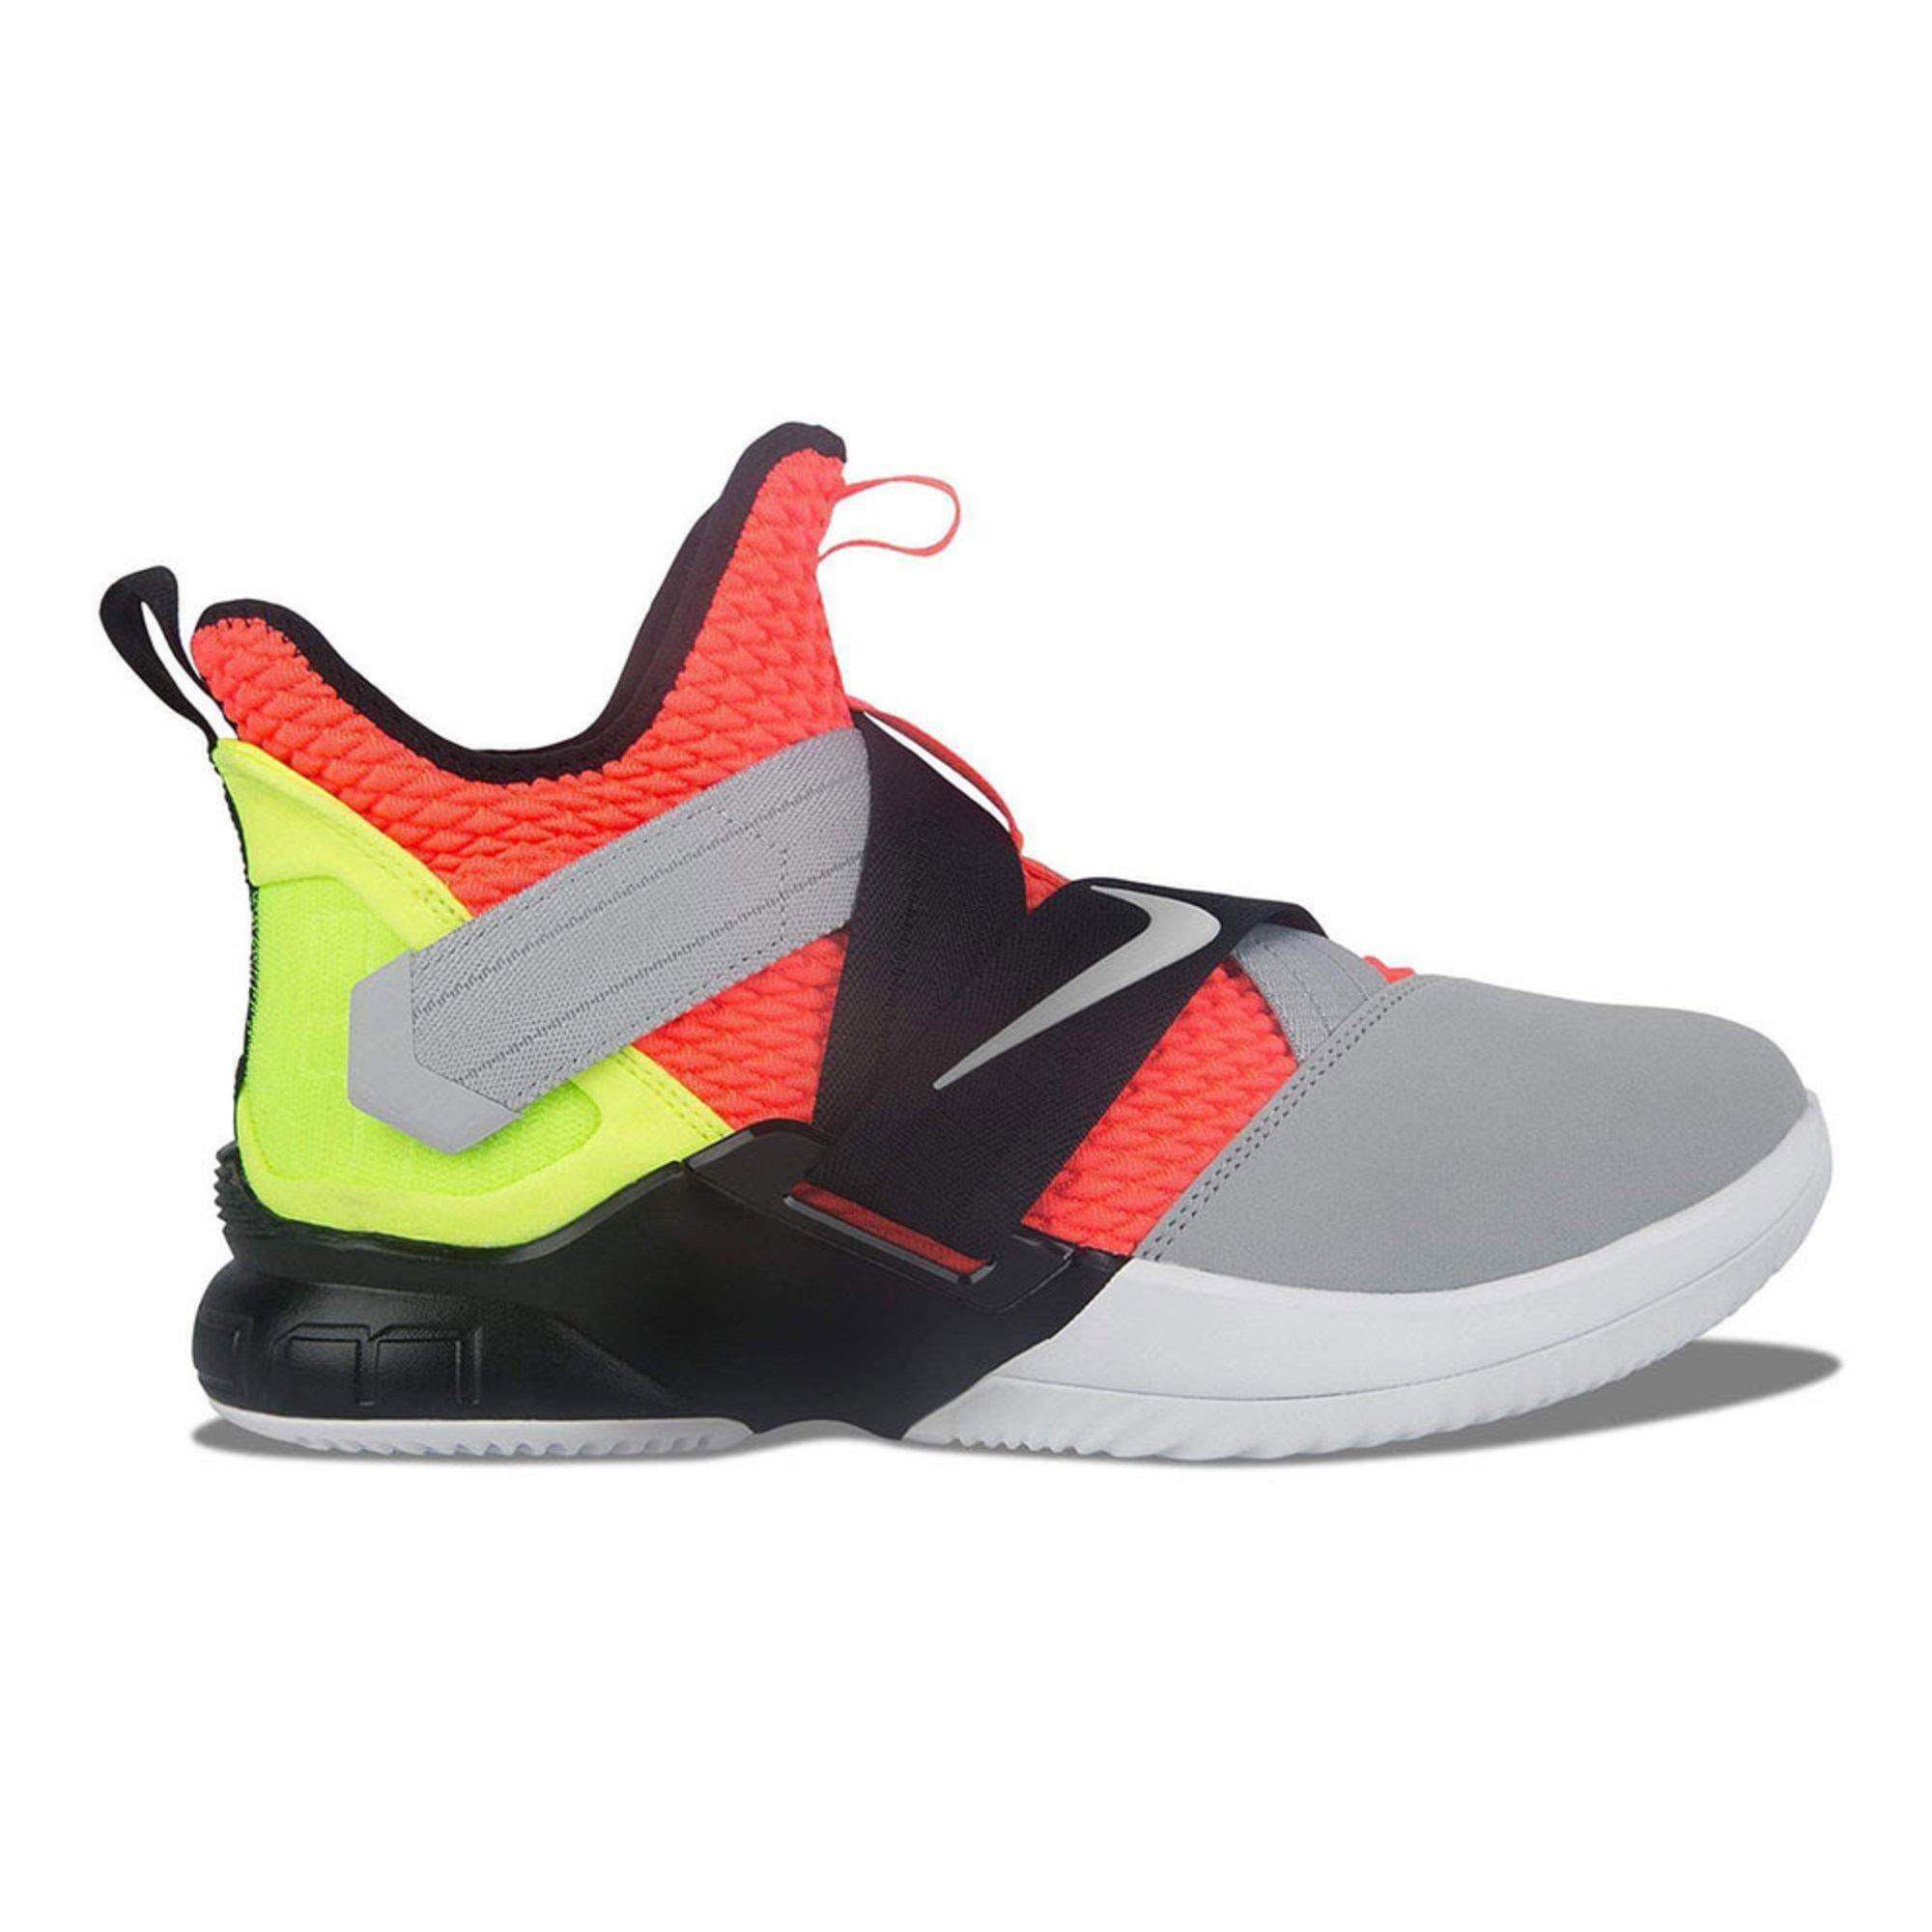 buy online 0835c 7a648 Nike Men's Lebron Soldier Xii Sfg Basketball Shoe | Men's ...